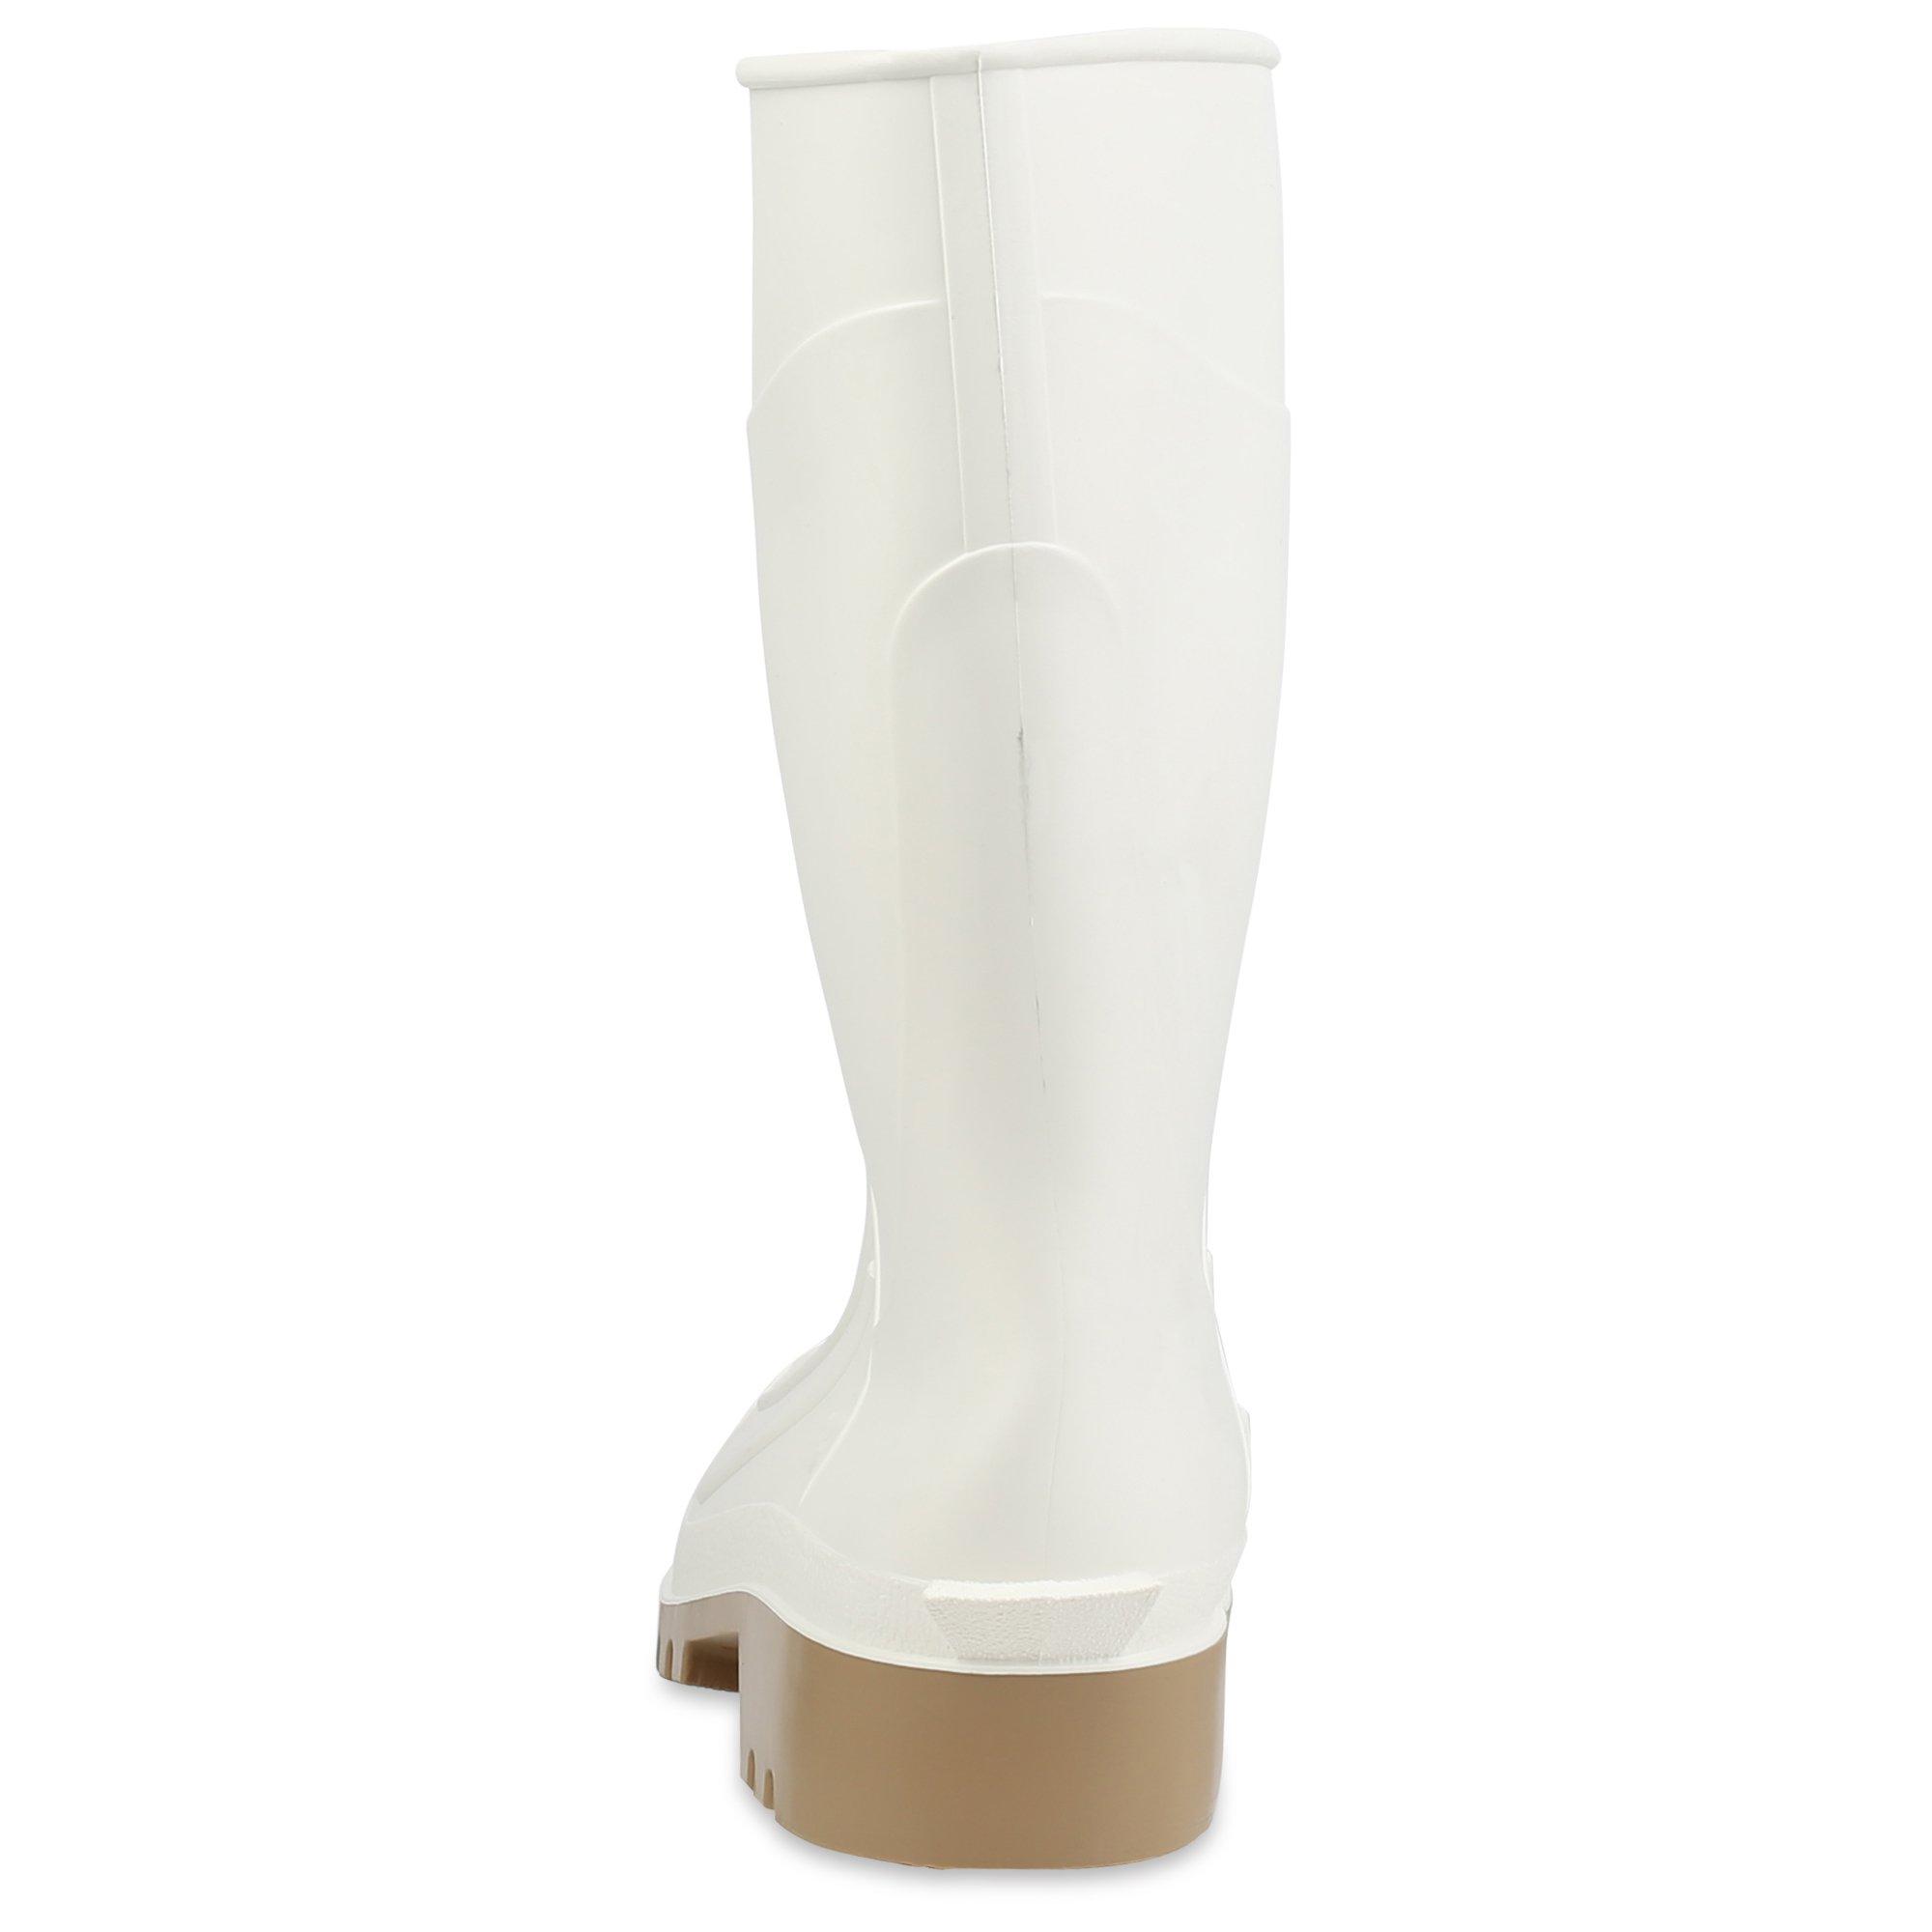 Servus 12'' PVC Polyblend Soft Toe Shrimp Boots, White (74928) by Honeywell (Image #3)